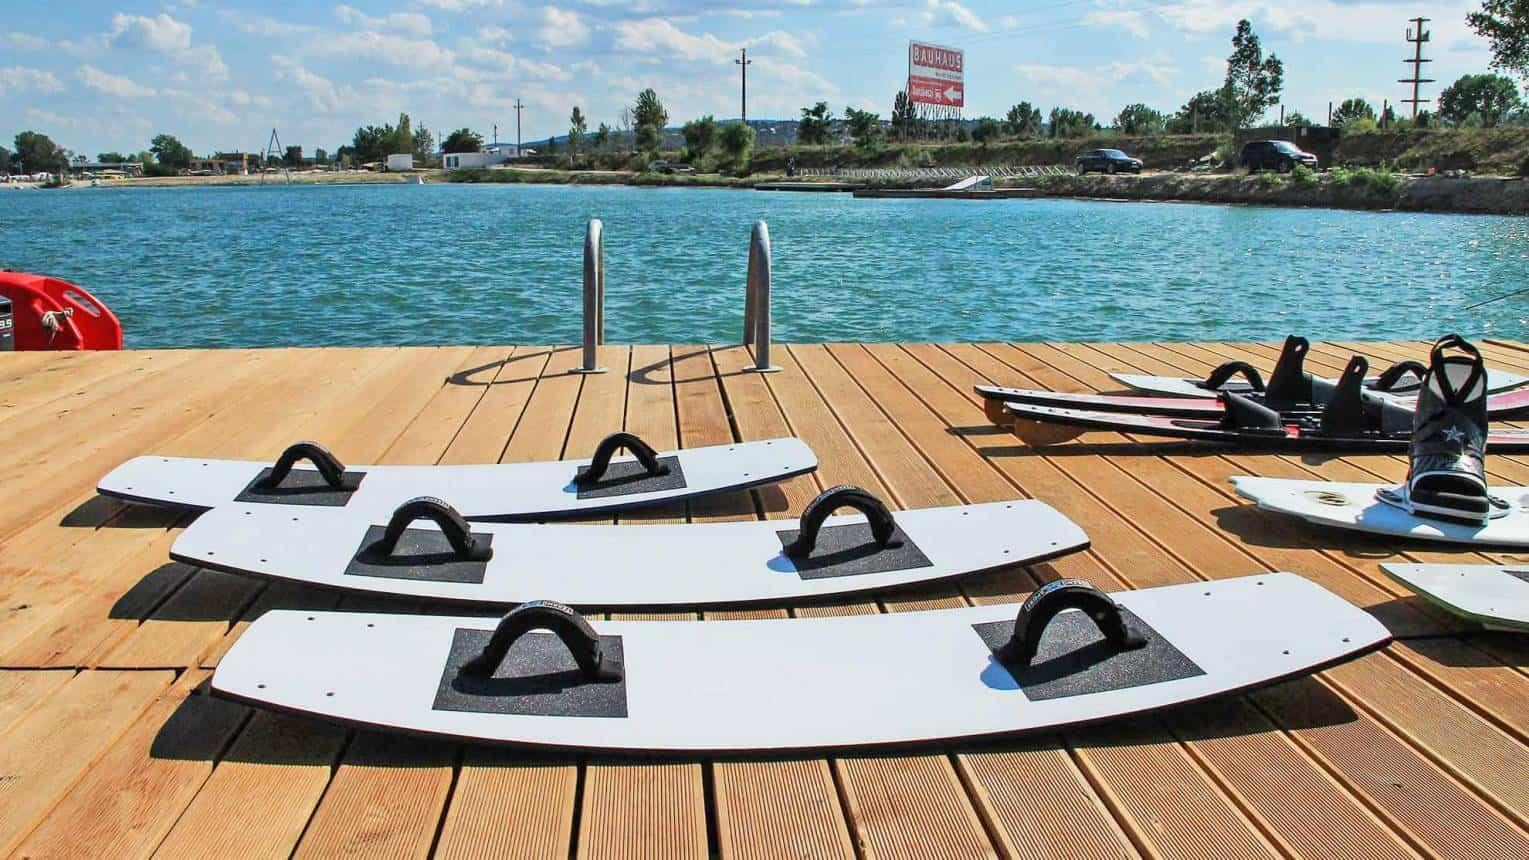 Alapozó wakeboard csomag